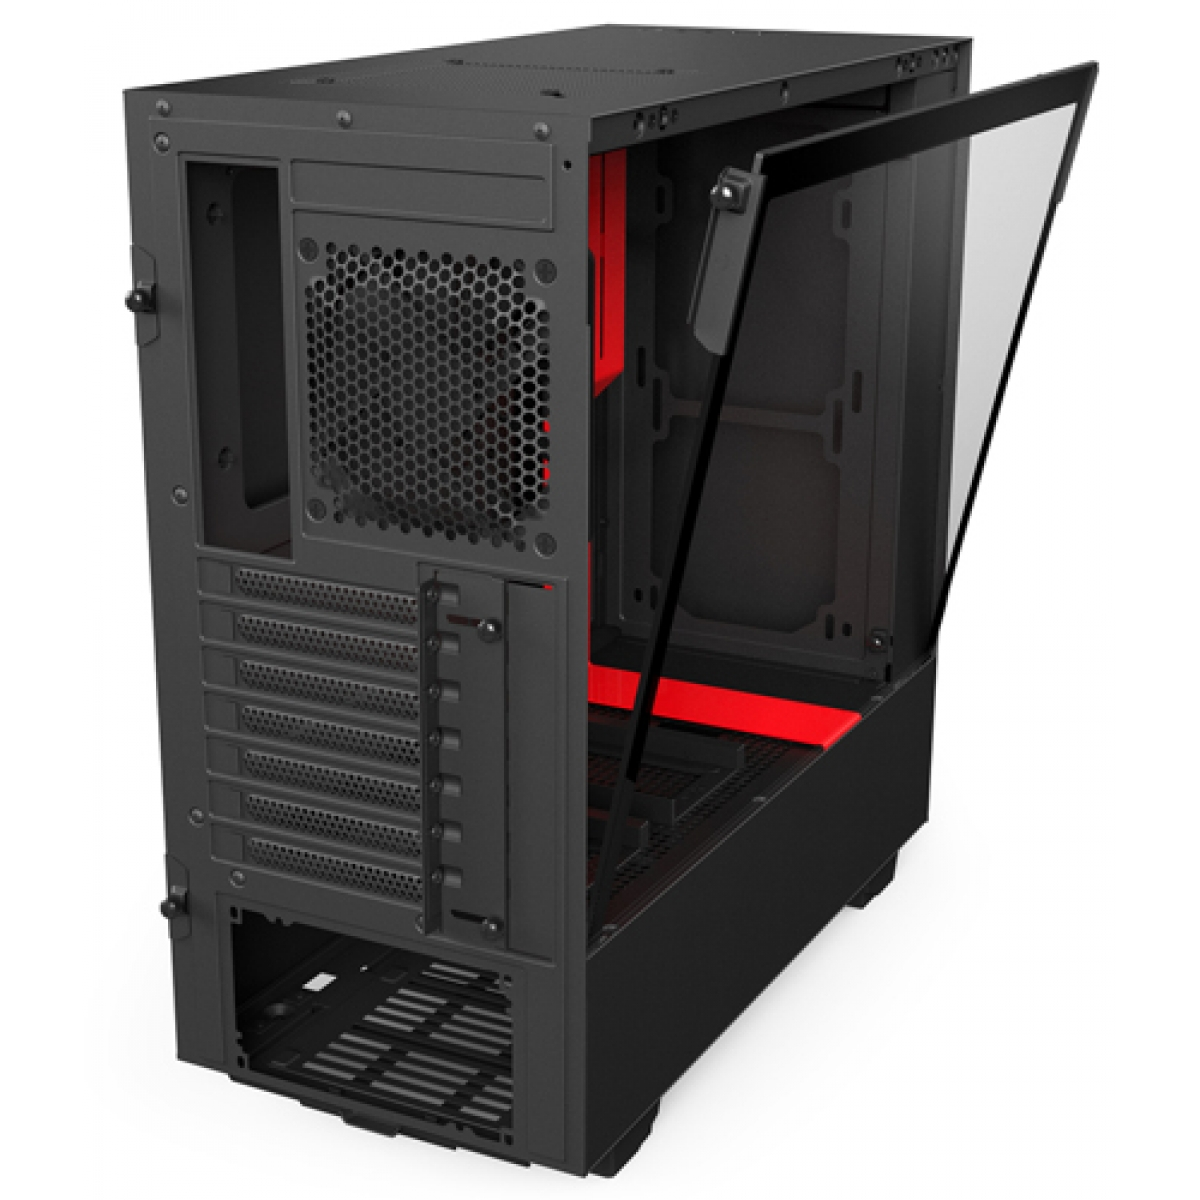 Gabinete Gamer NZXT H500, Mid Tower, Com 2 Fans, Vidro Temperado, Black-Red, Sem Fonte, CA-H500B-BR